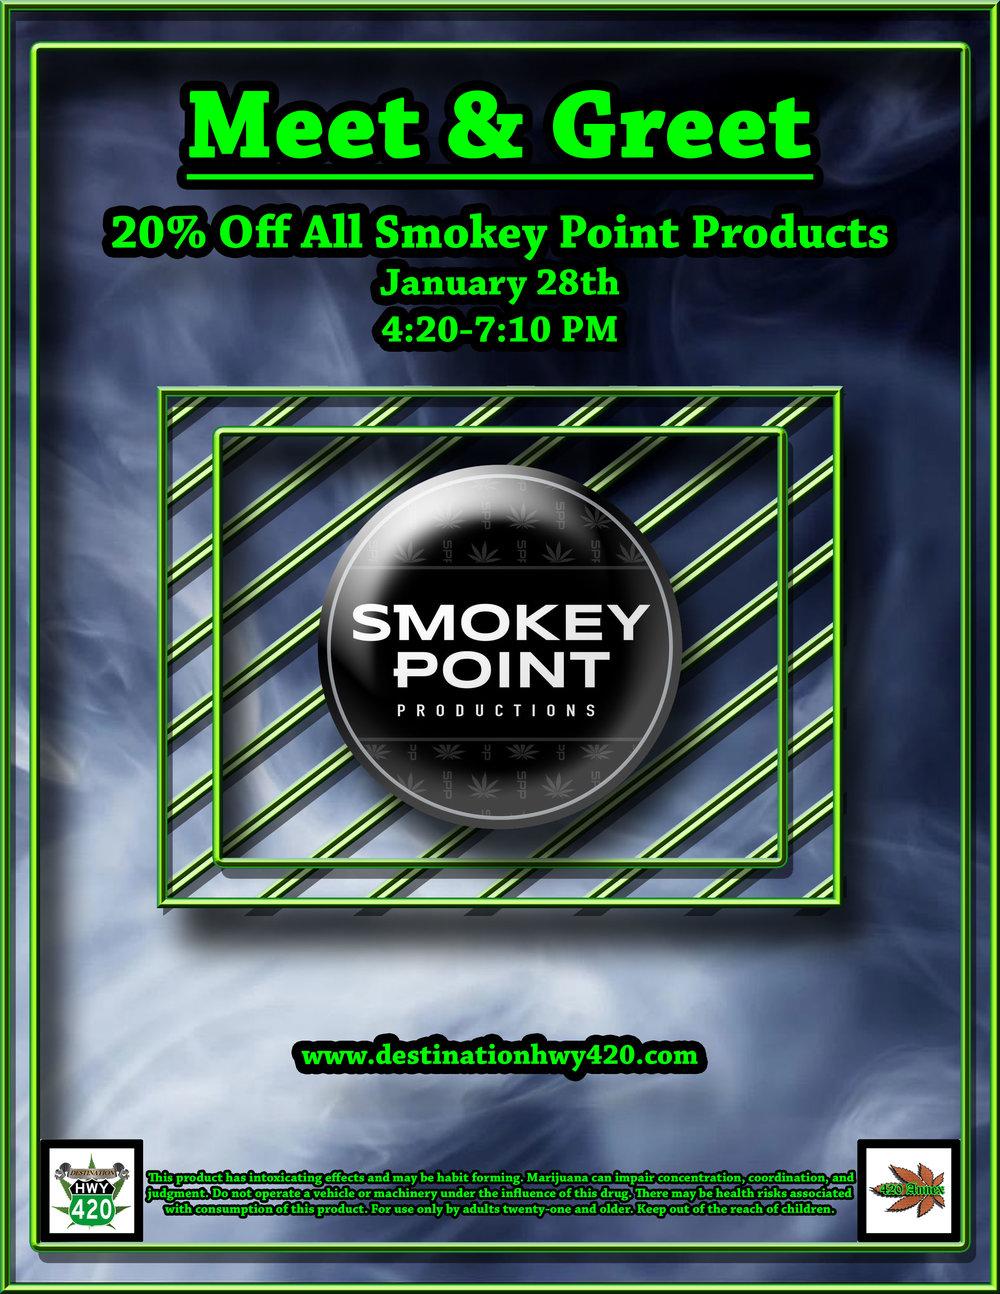 Smokey-Point-Meet-&-Greet-012818.jpg